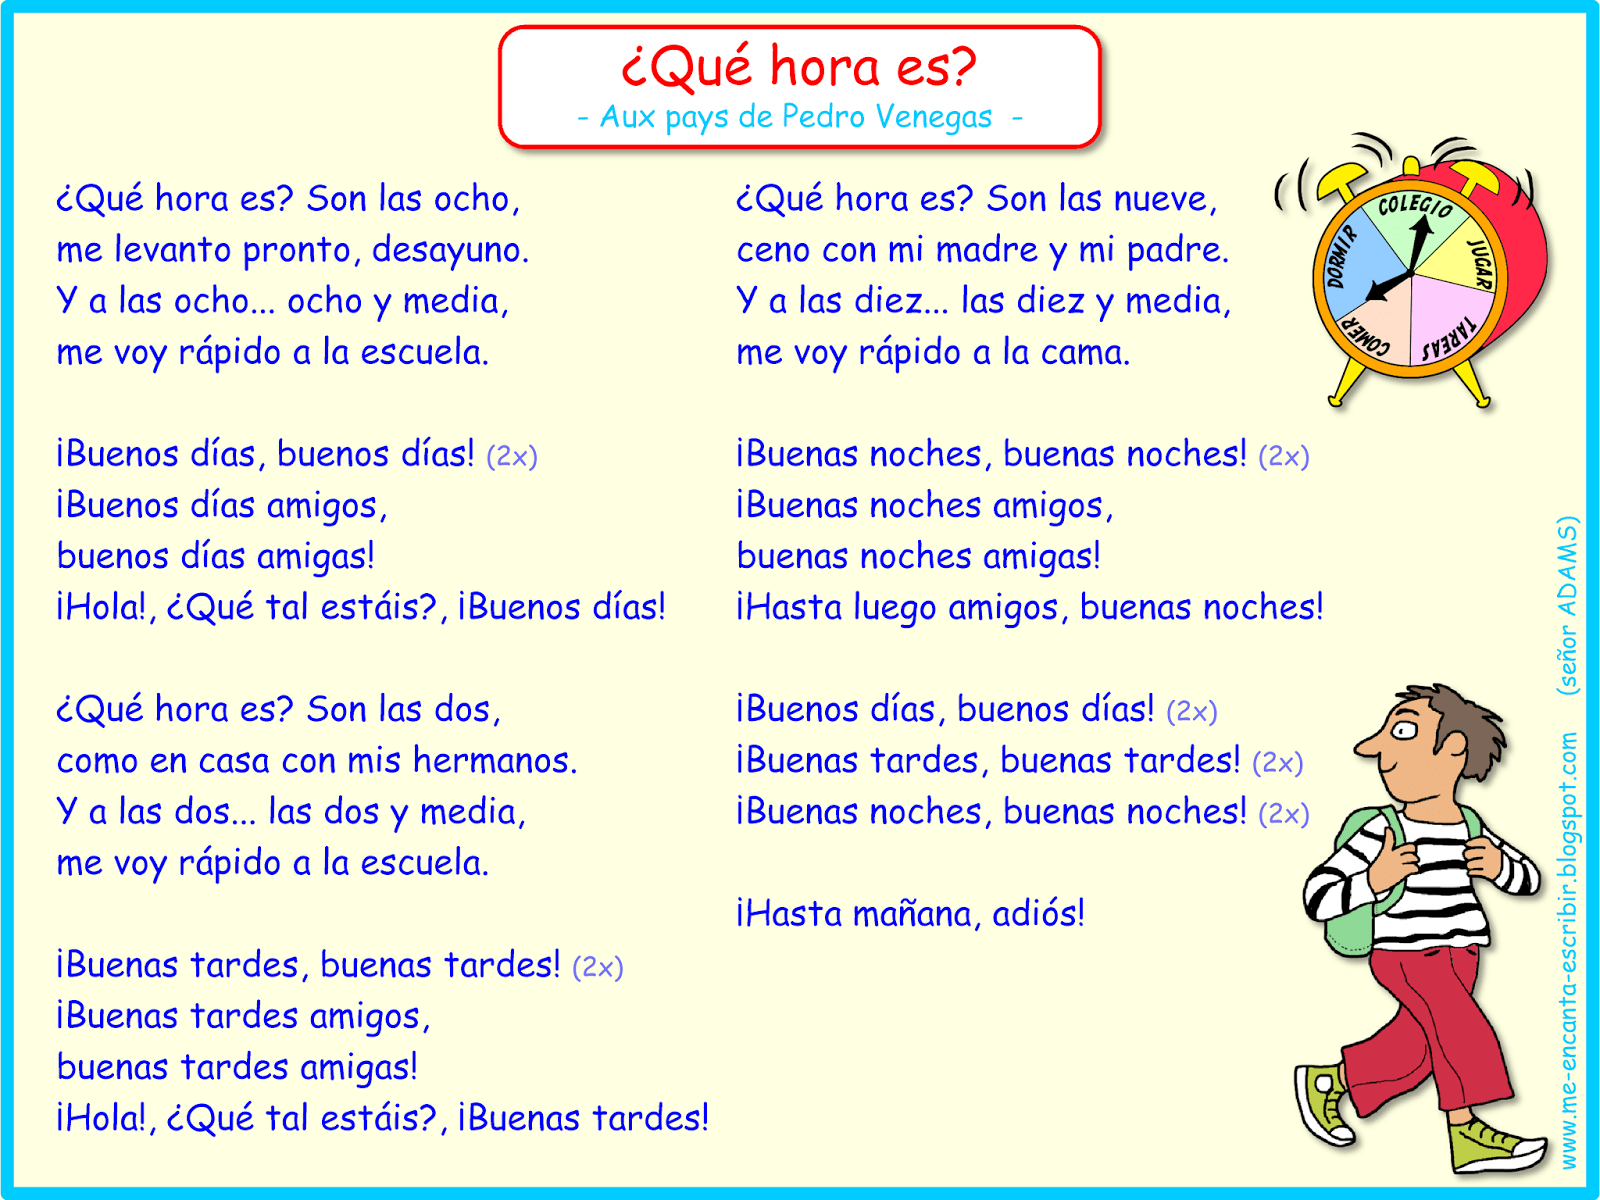 Cancion Que Hora Es Aux Pays De Pedro Venegas Rutina